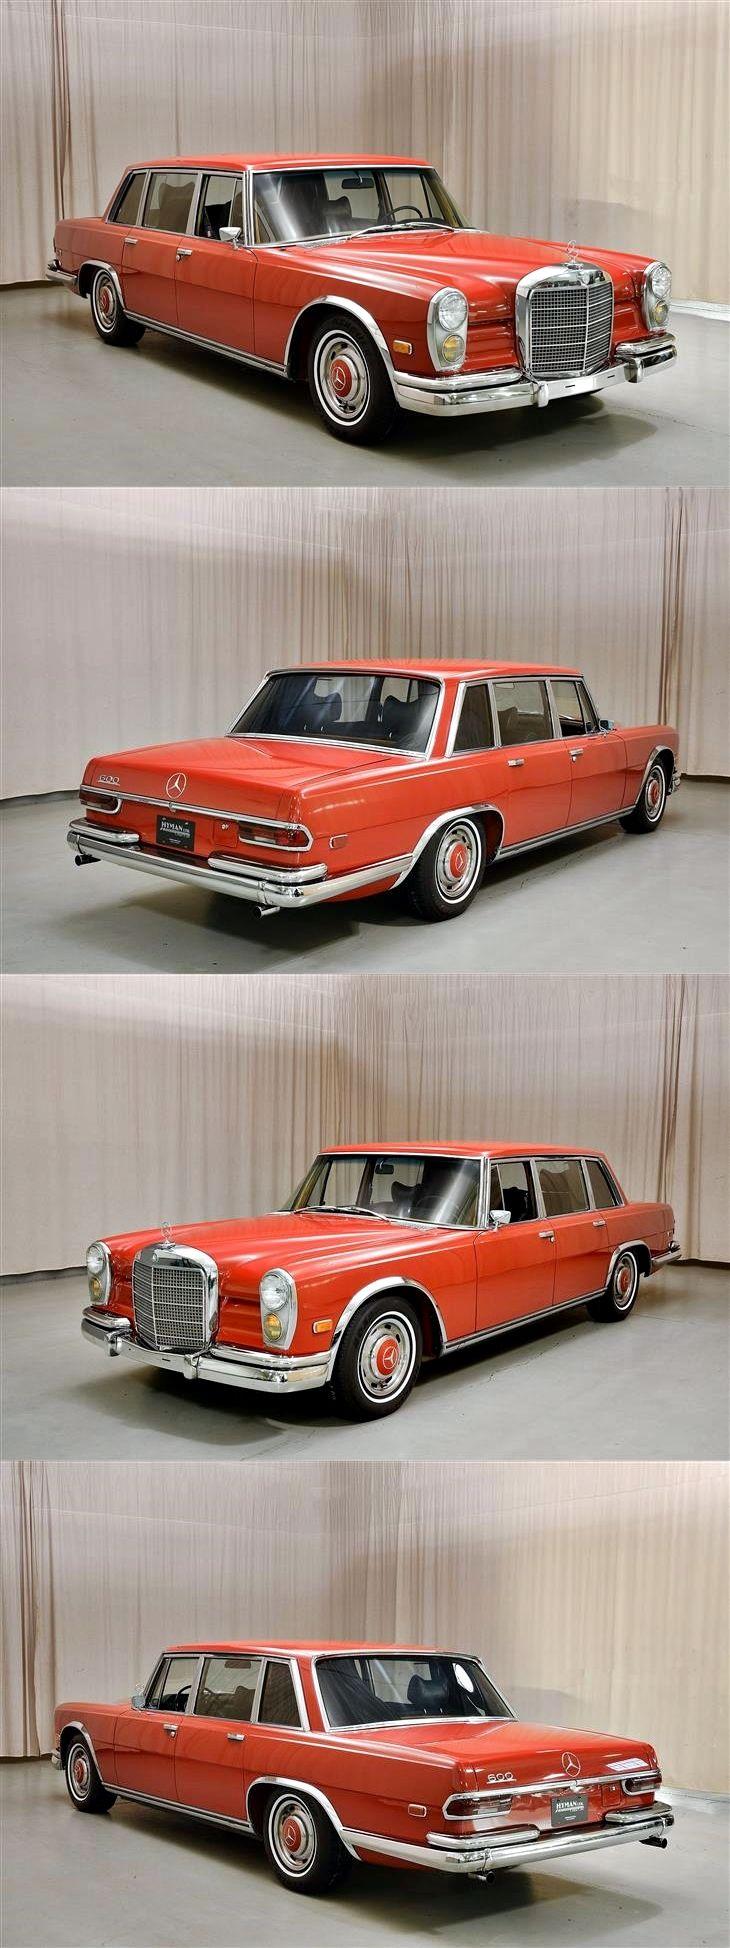 1969 mercedes-benz 600 sedan